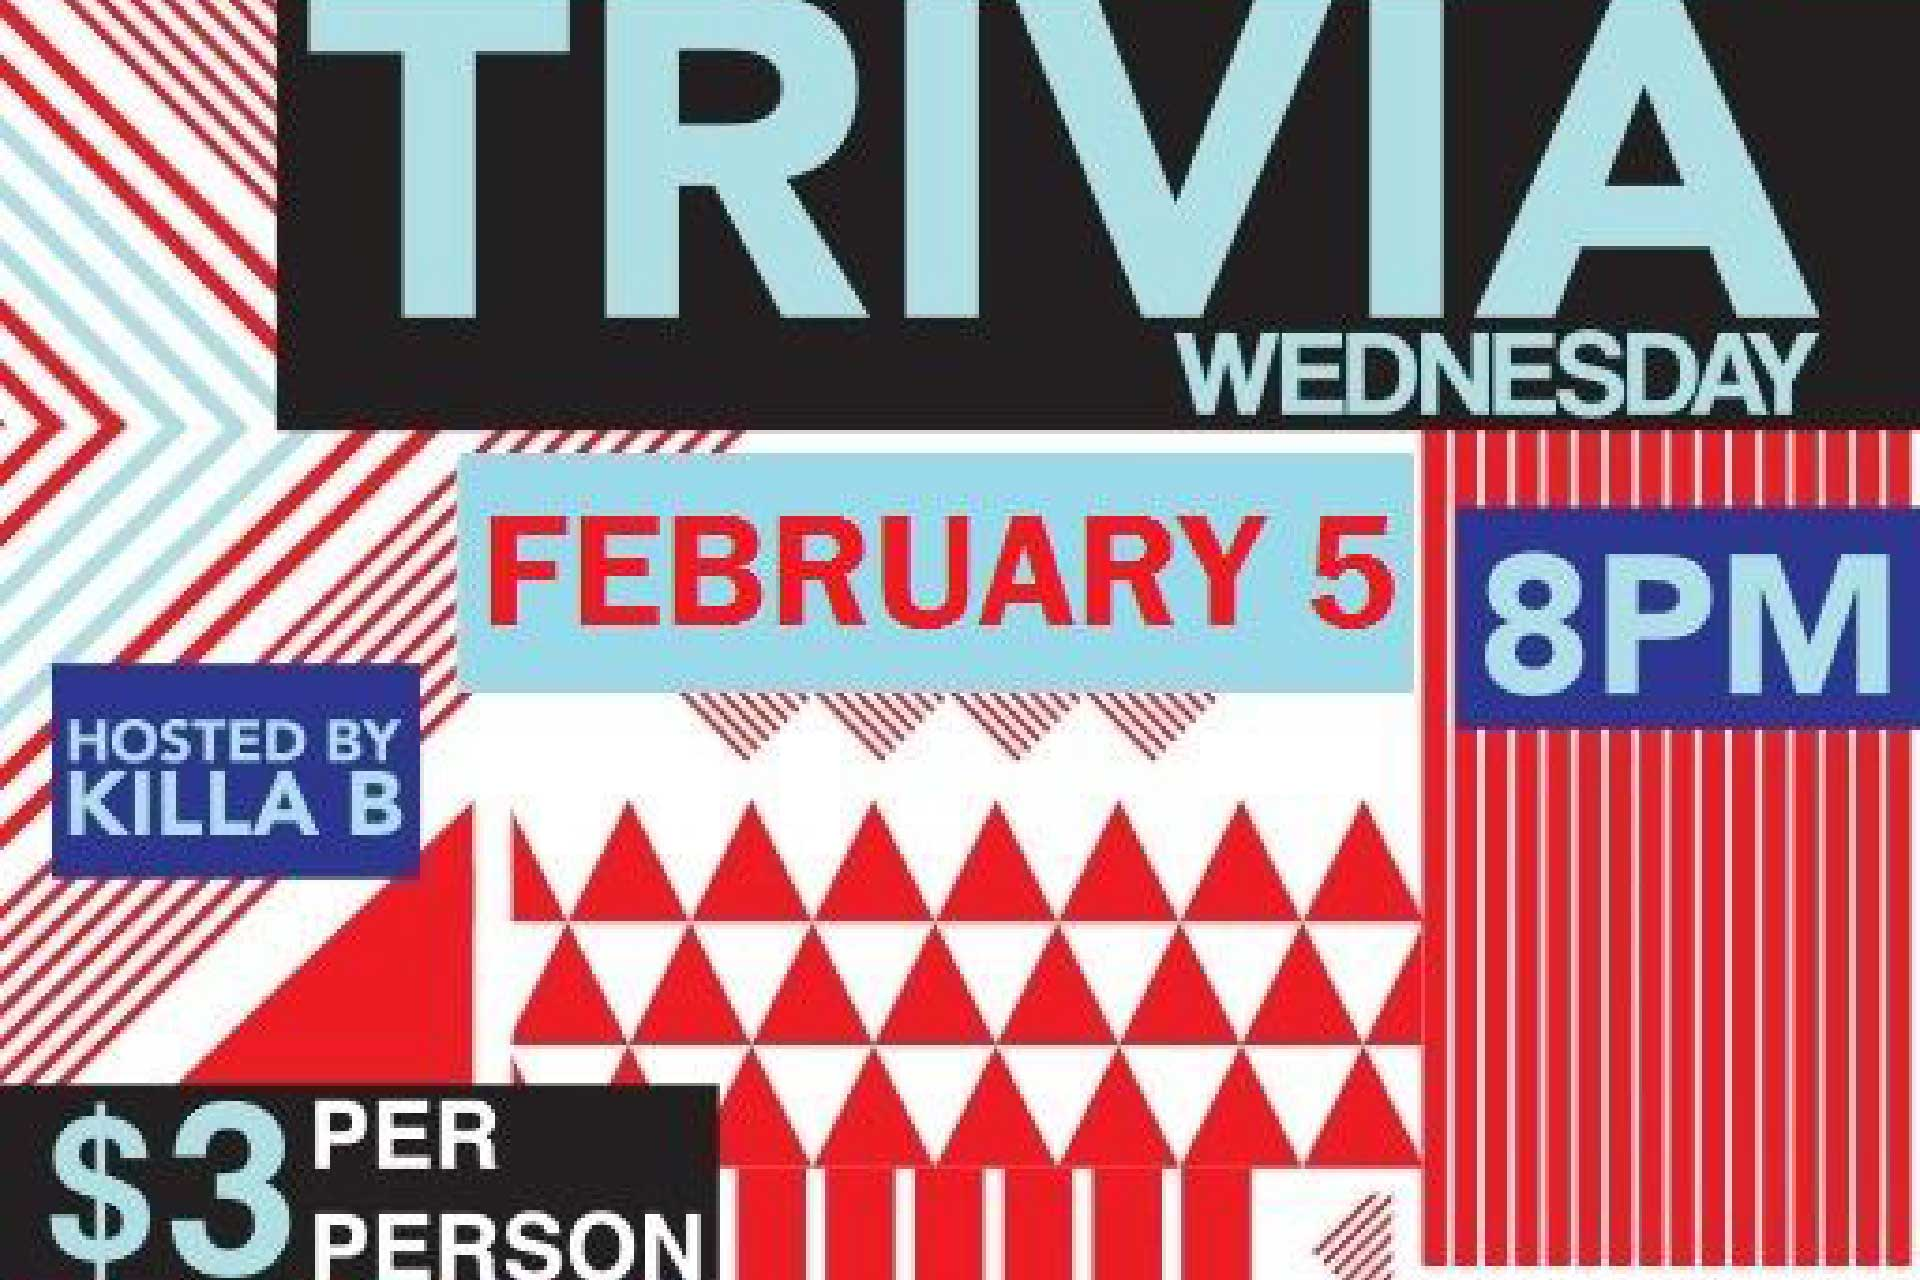 Hillside February Trivia